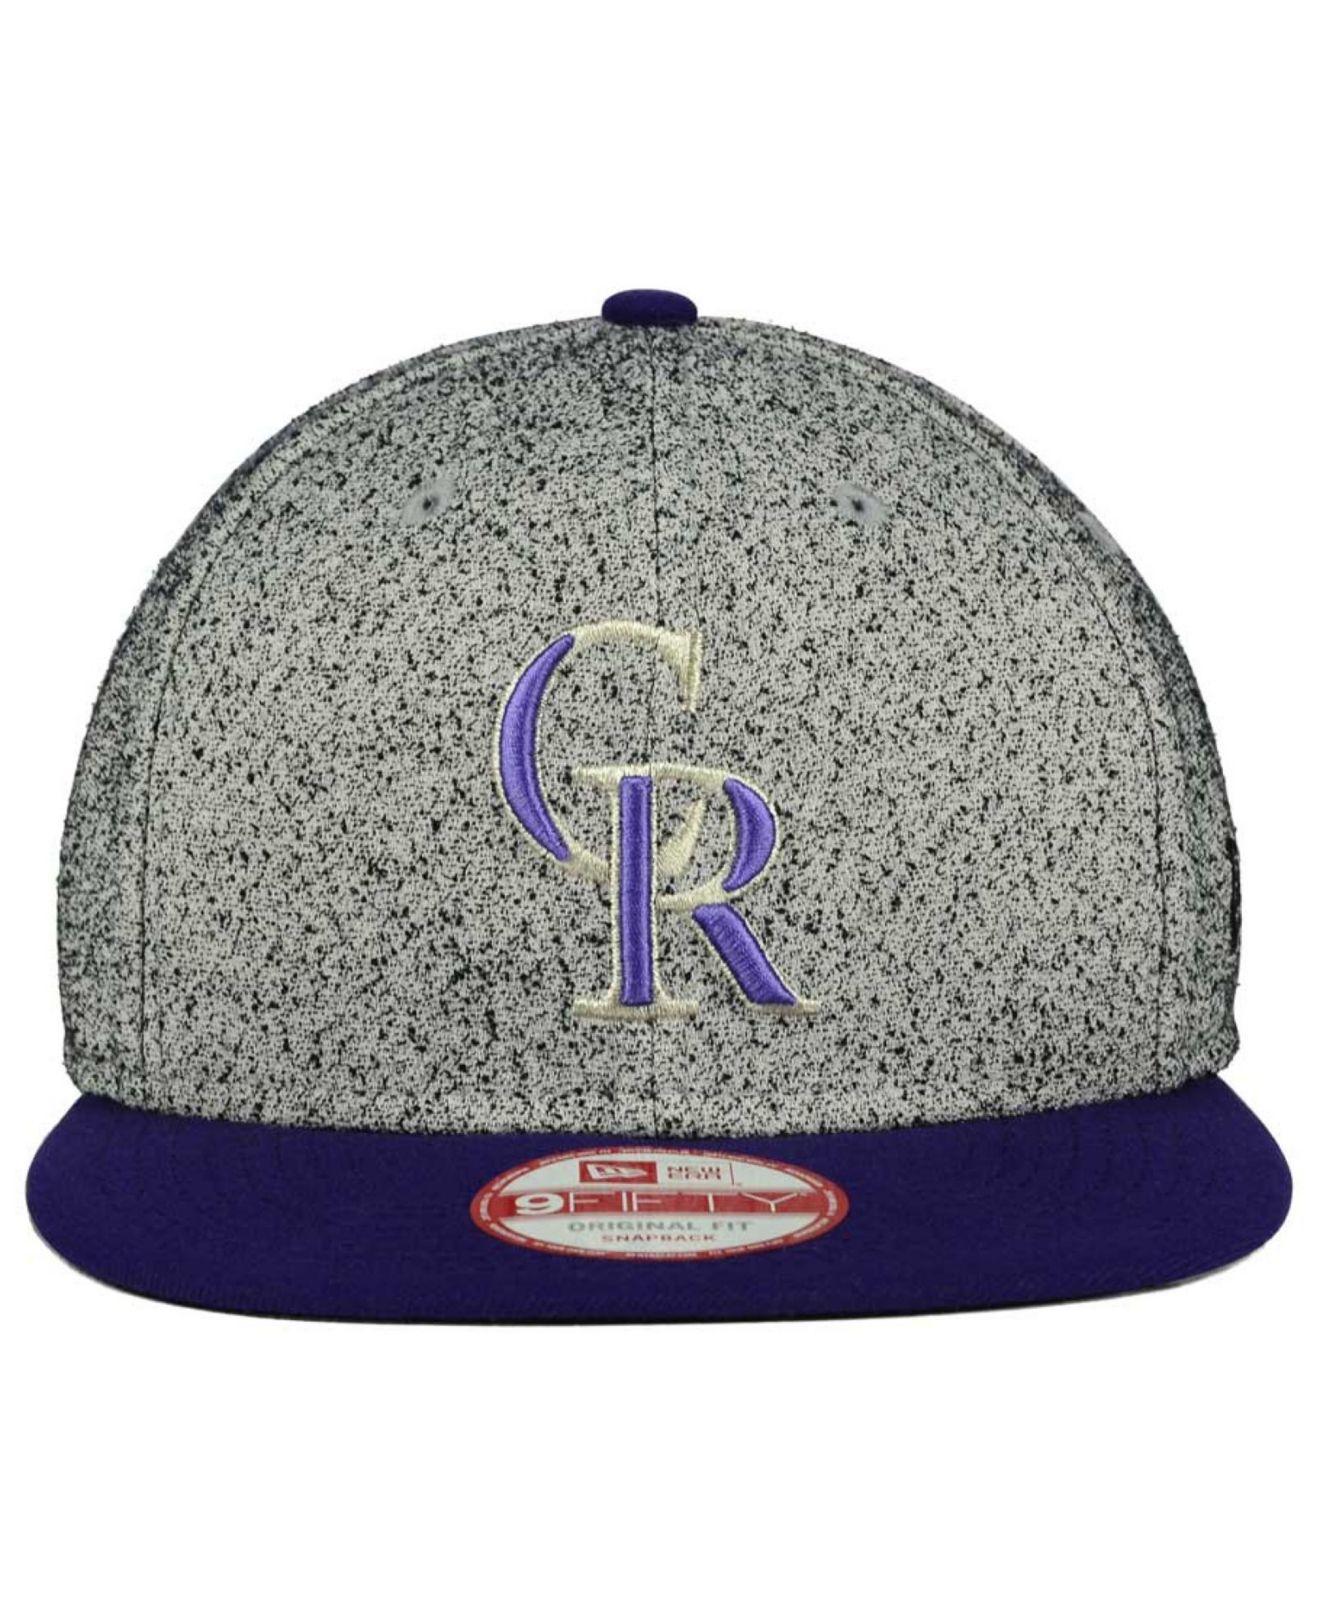 brand new 030bf c6015 ... best price lyst ktz colorado rockies spec 9fifty snapback cap in gray  for men 36593 b01e2